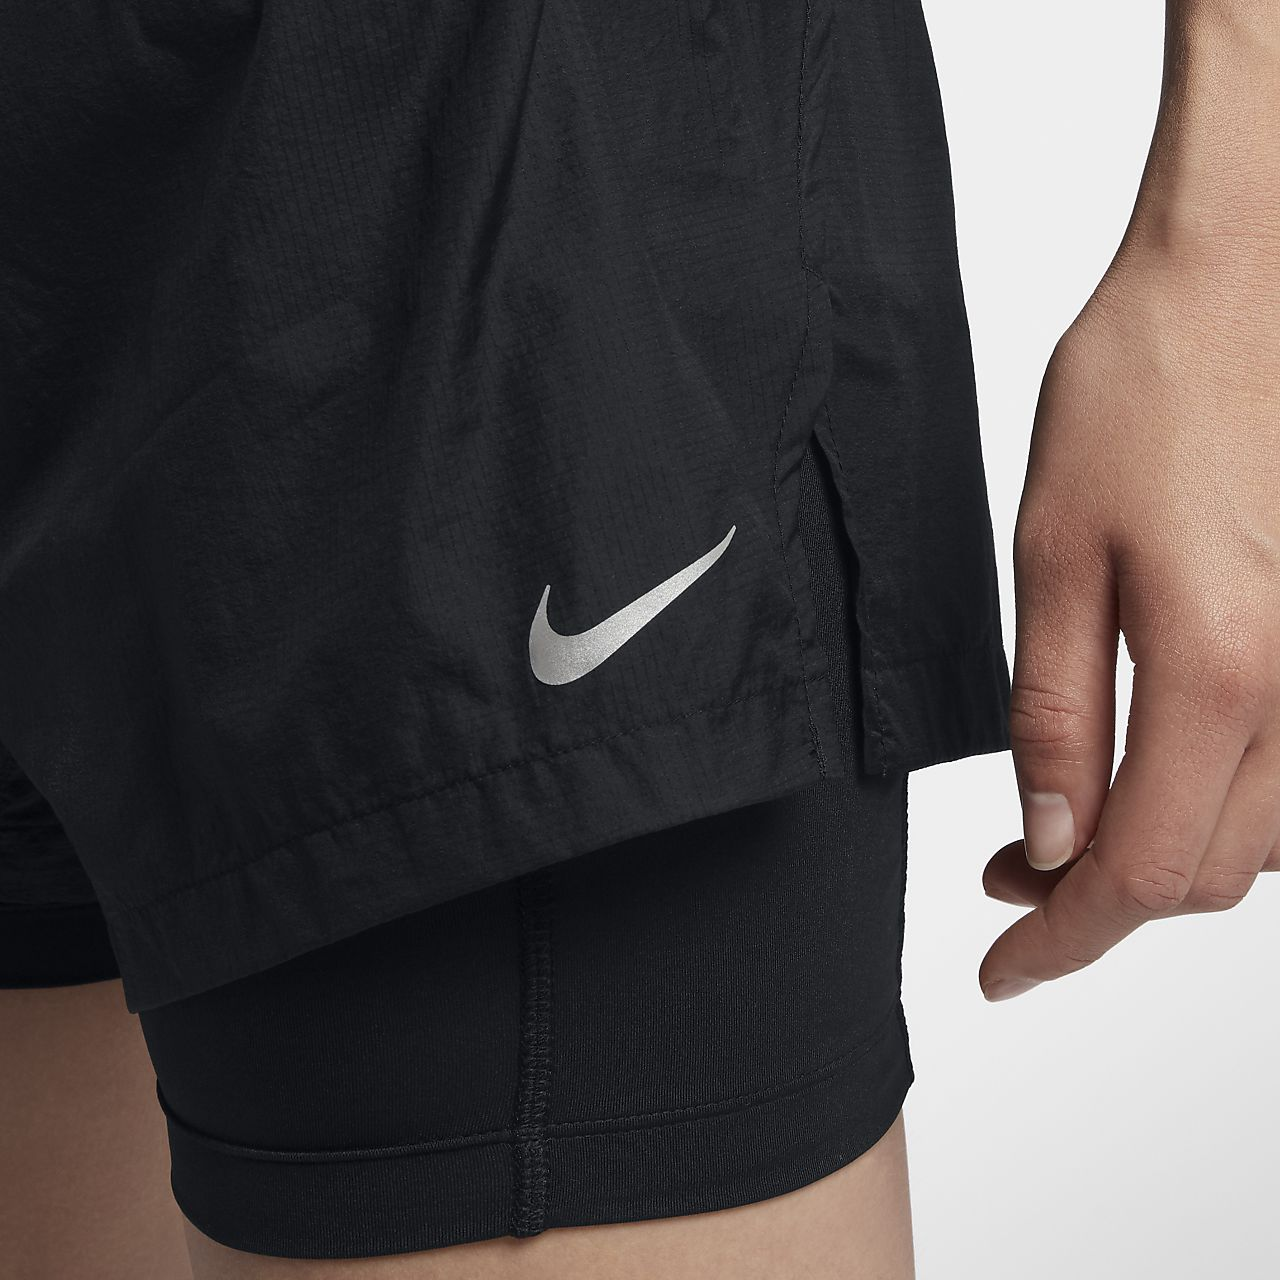 ... Short de running Nike Run Division Elevate 2-in-1 8 cm pour Femme